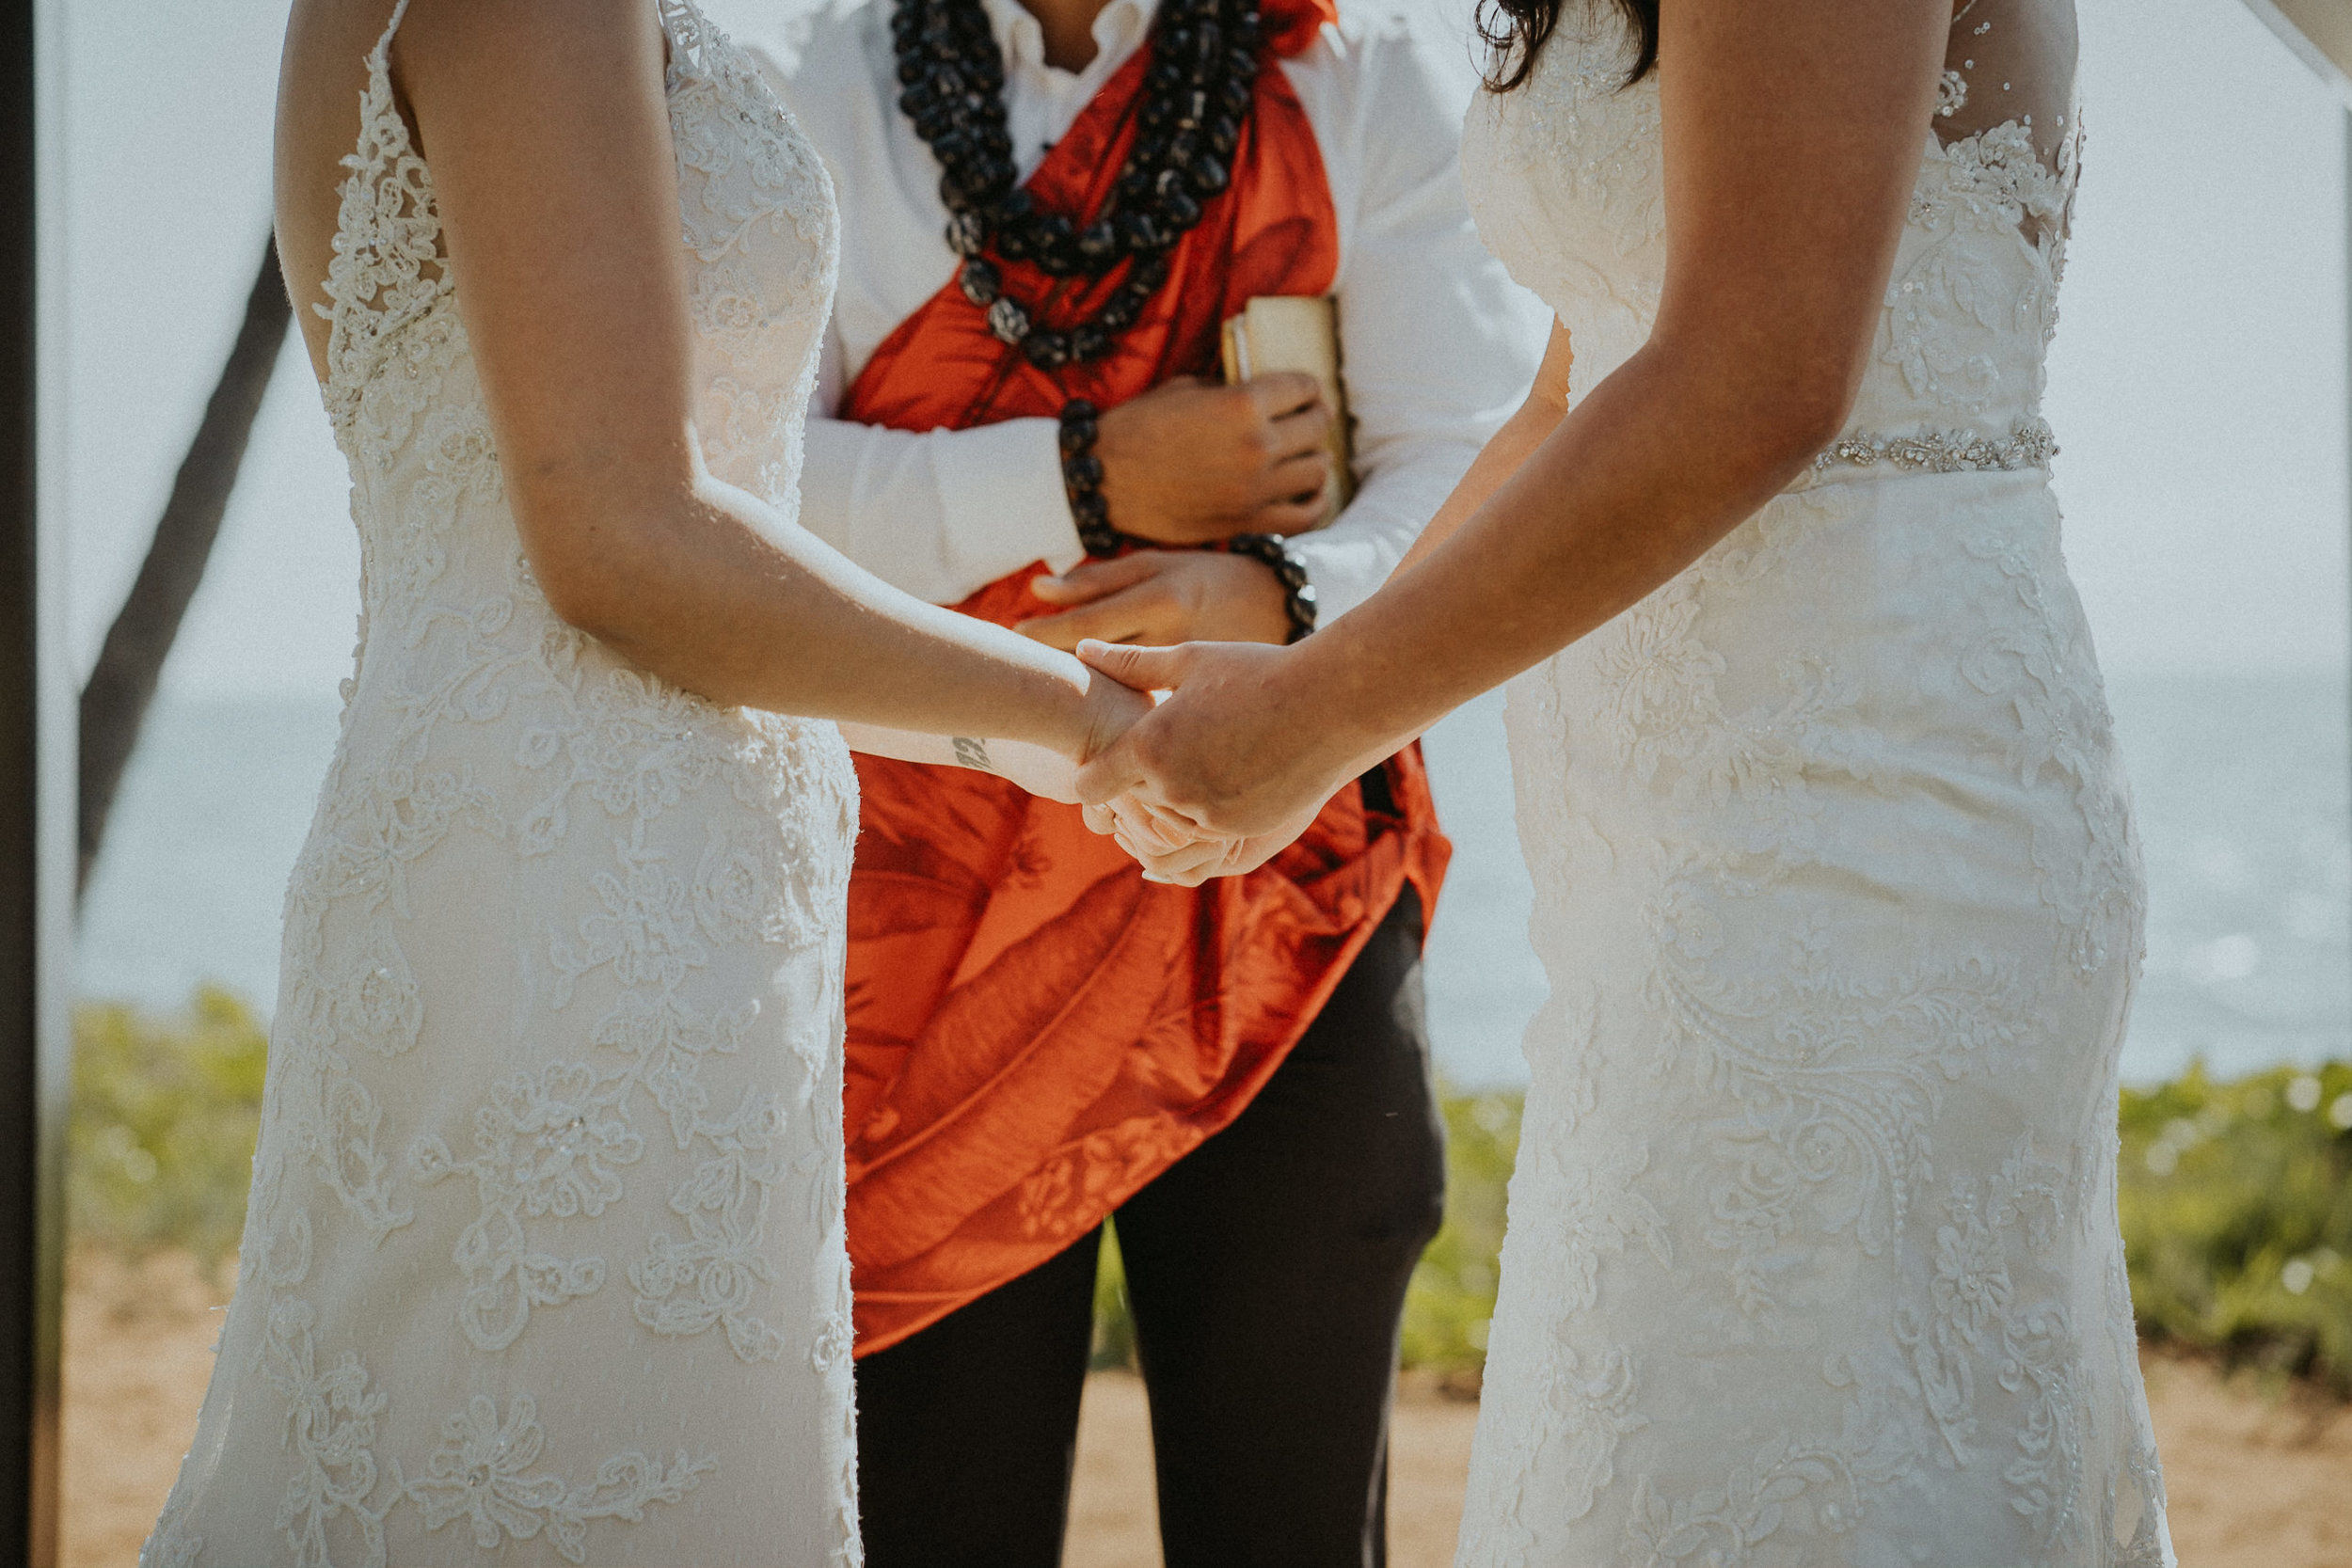 Maui_Destination_wedding_Alfred_Tang-7.jpg